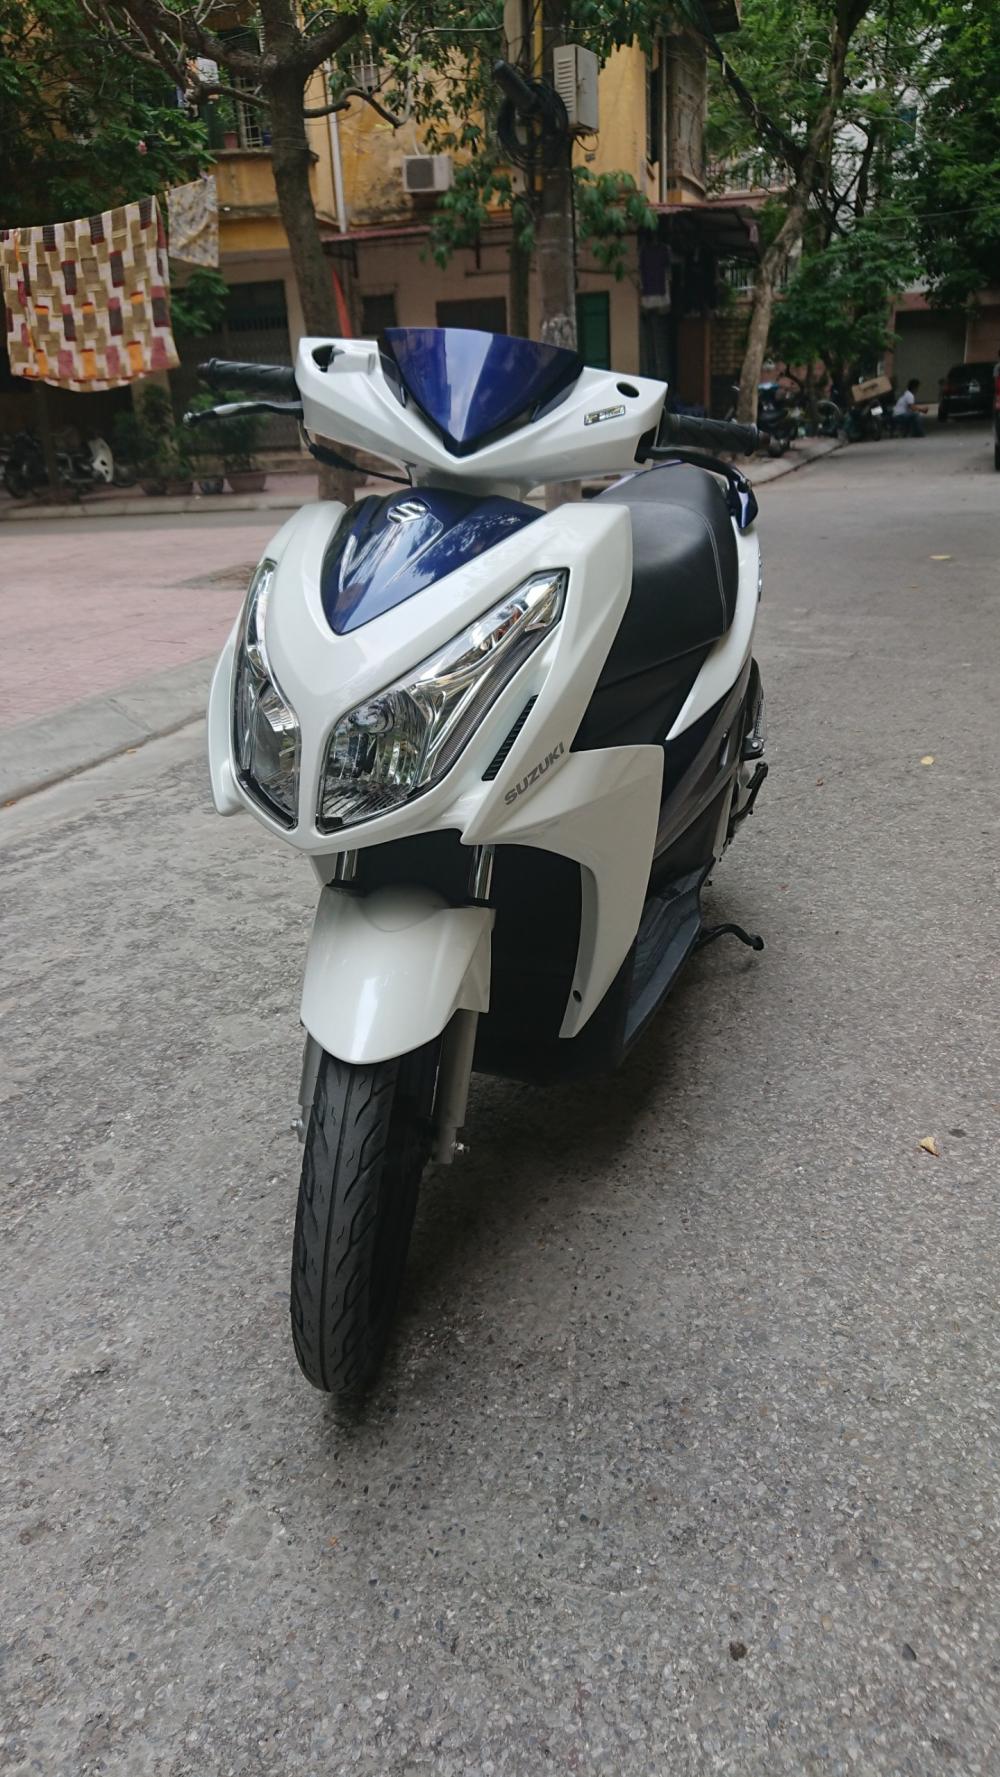 ban xe Suzuki Impulse xanh trang 2015 it dung chinh chu bien HN - 5